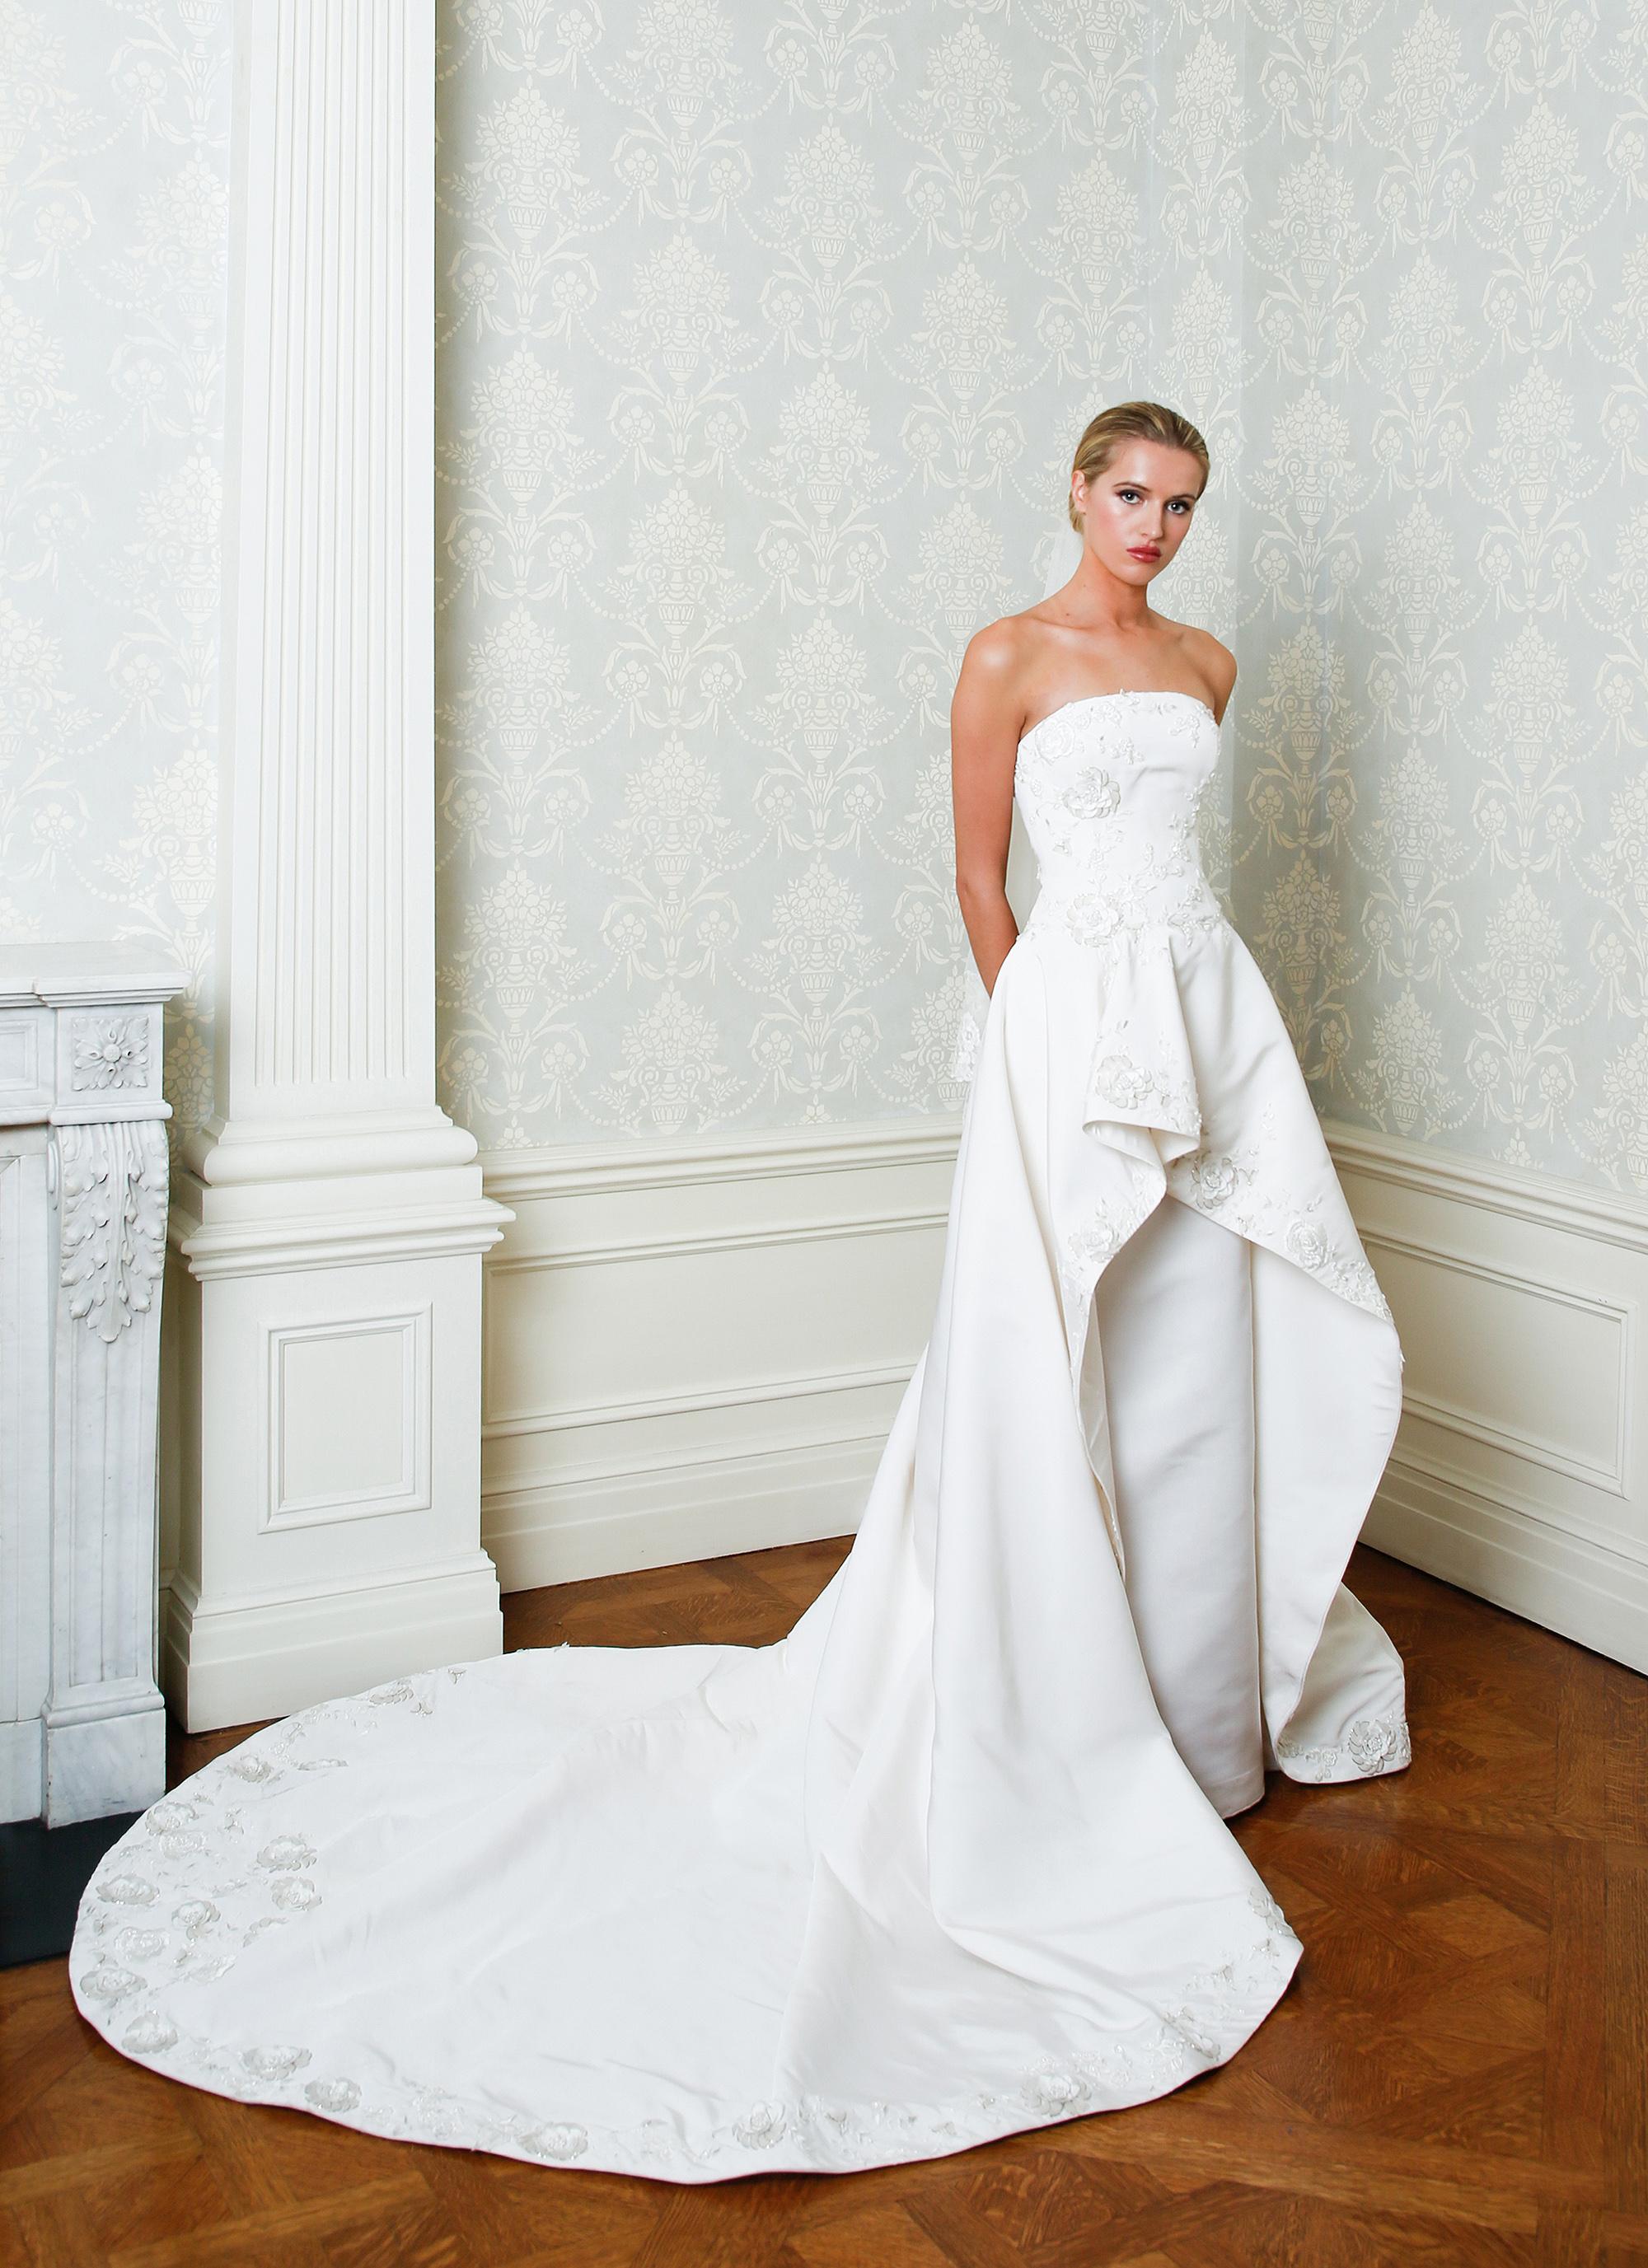 Cristina Ottaviano wedding dress spring 2019 strapless sheath with overskirt